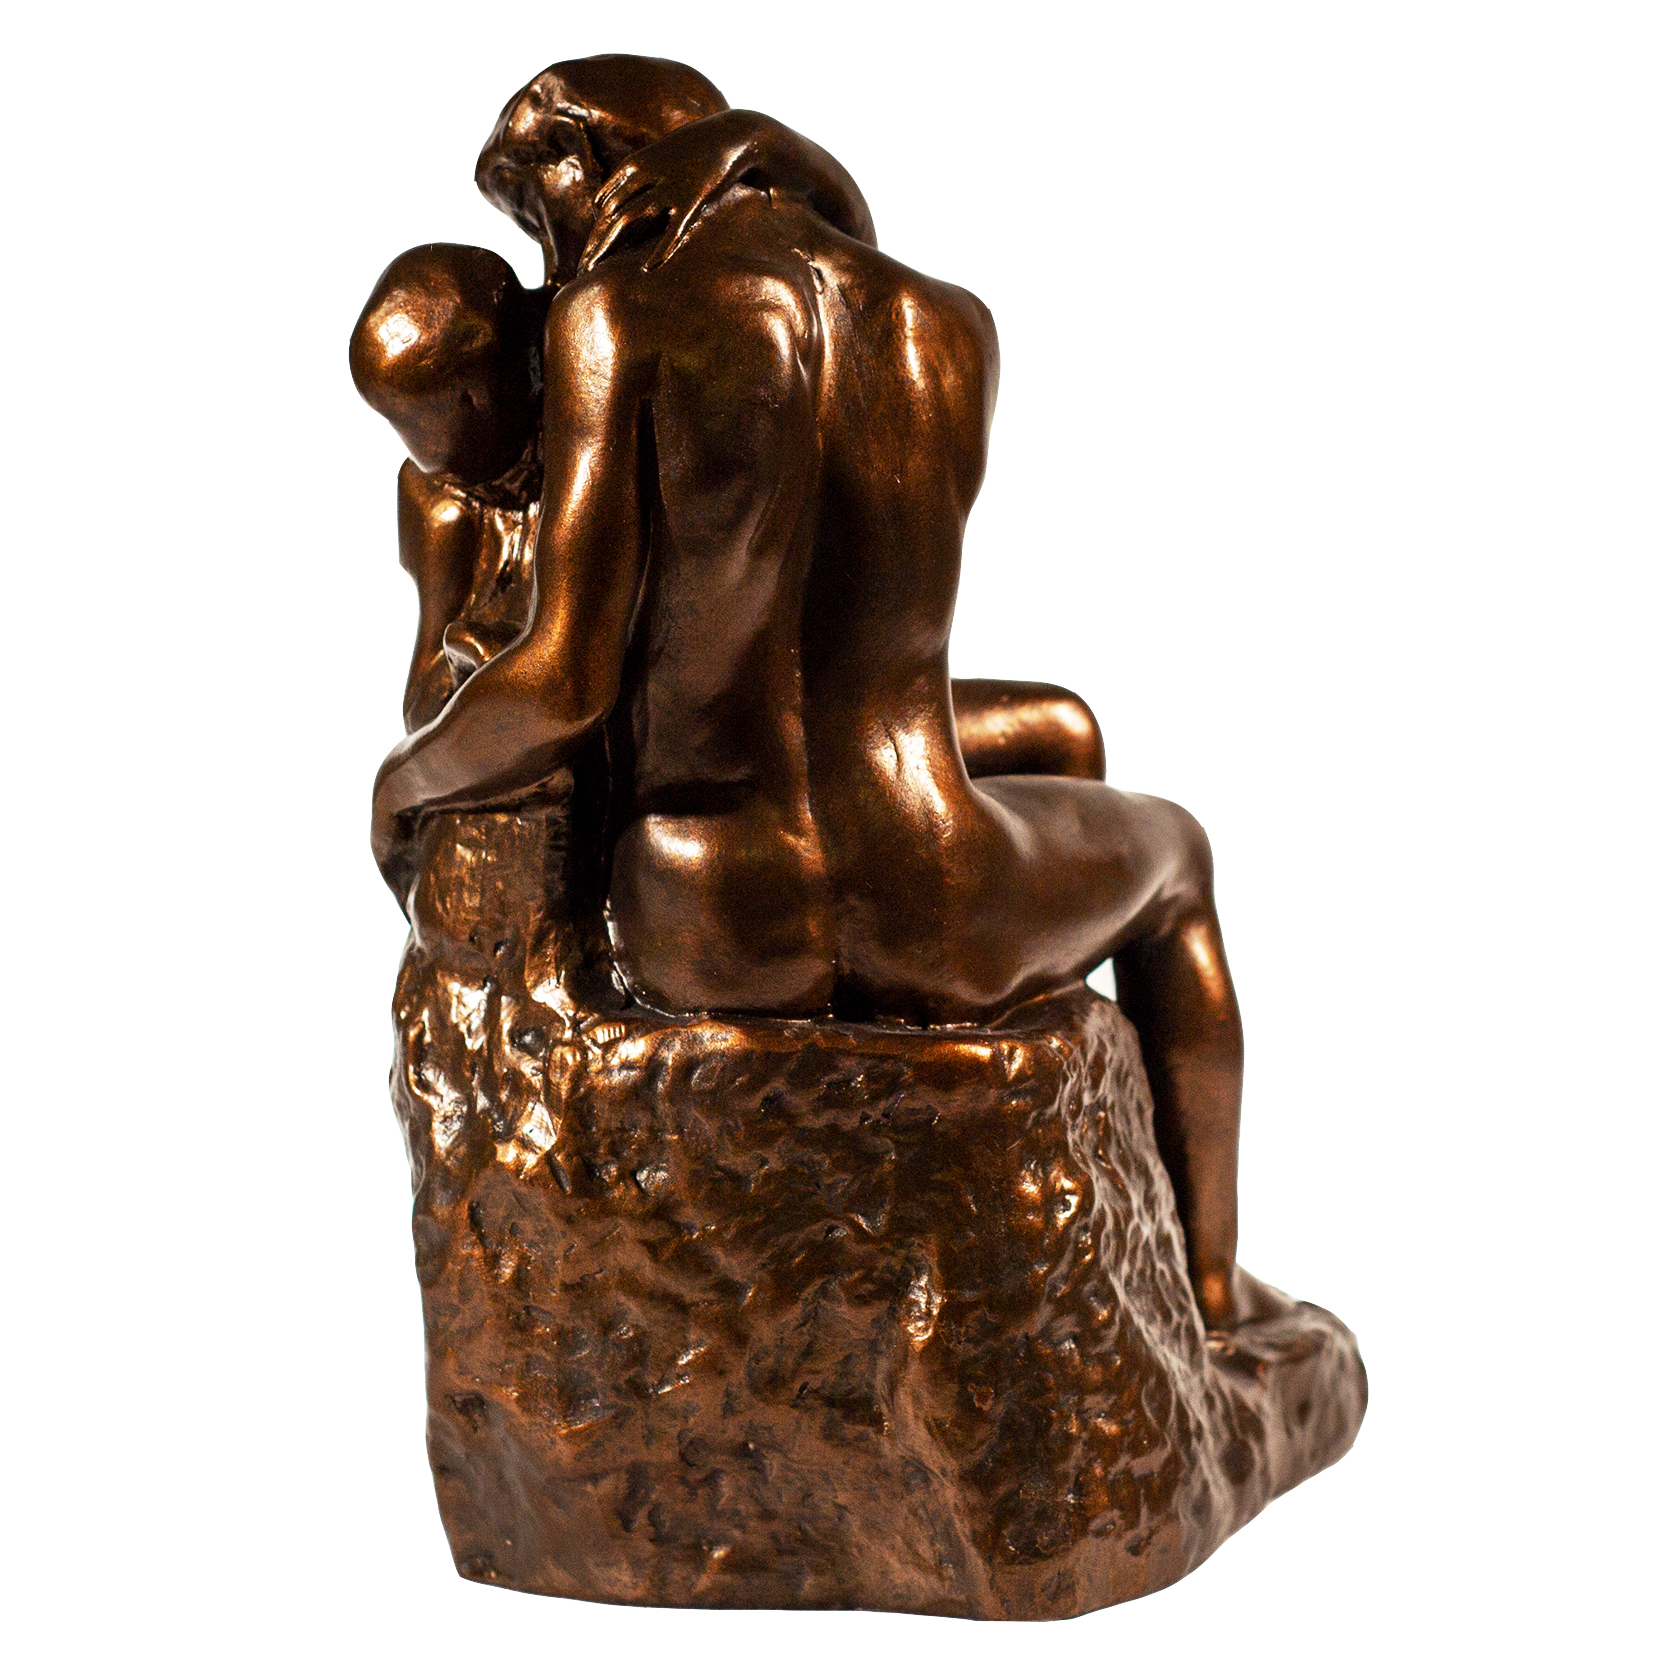 De Kus Rodin 24 cm *